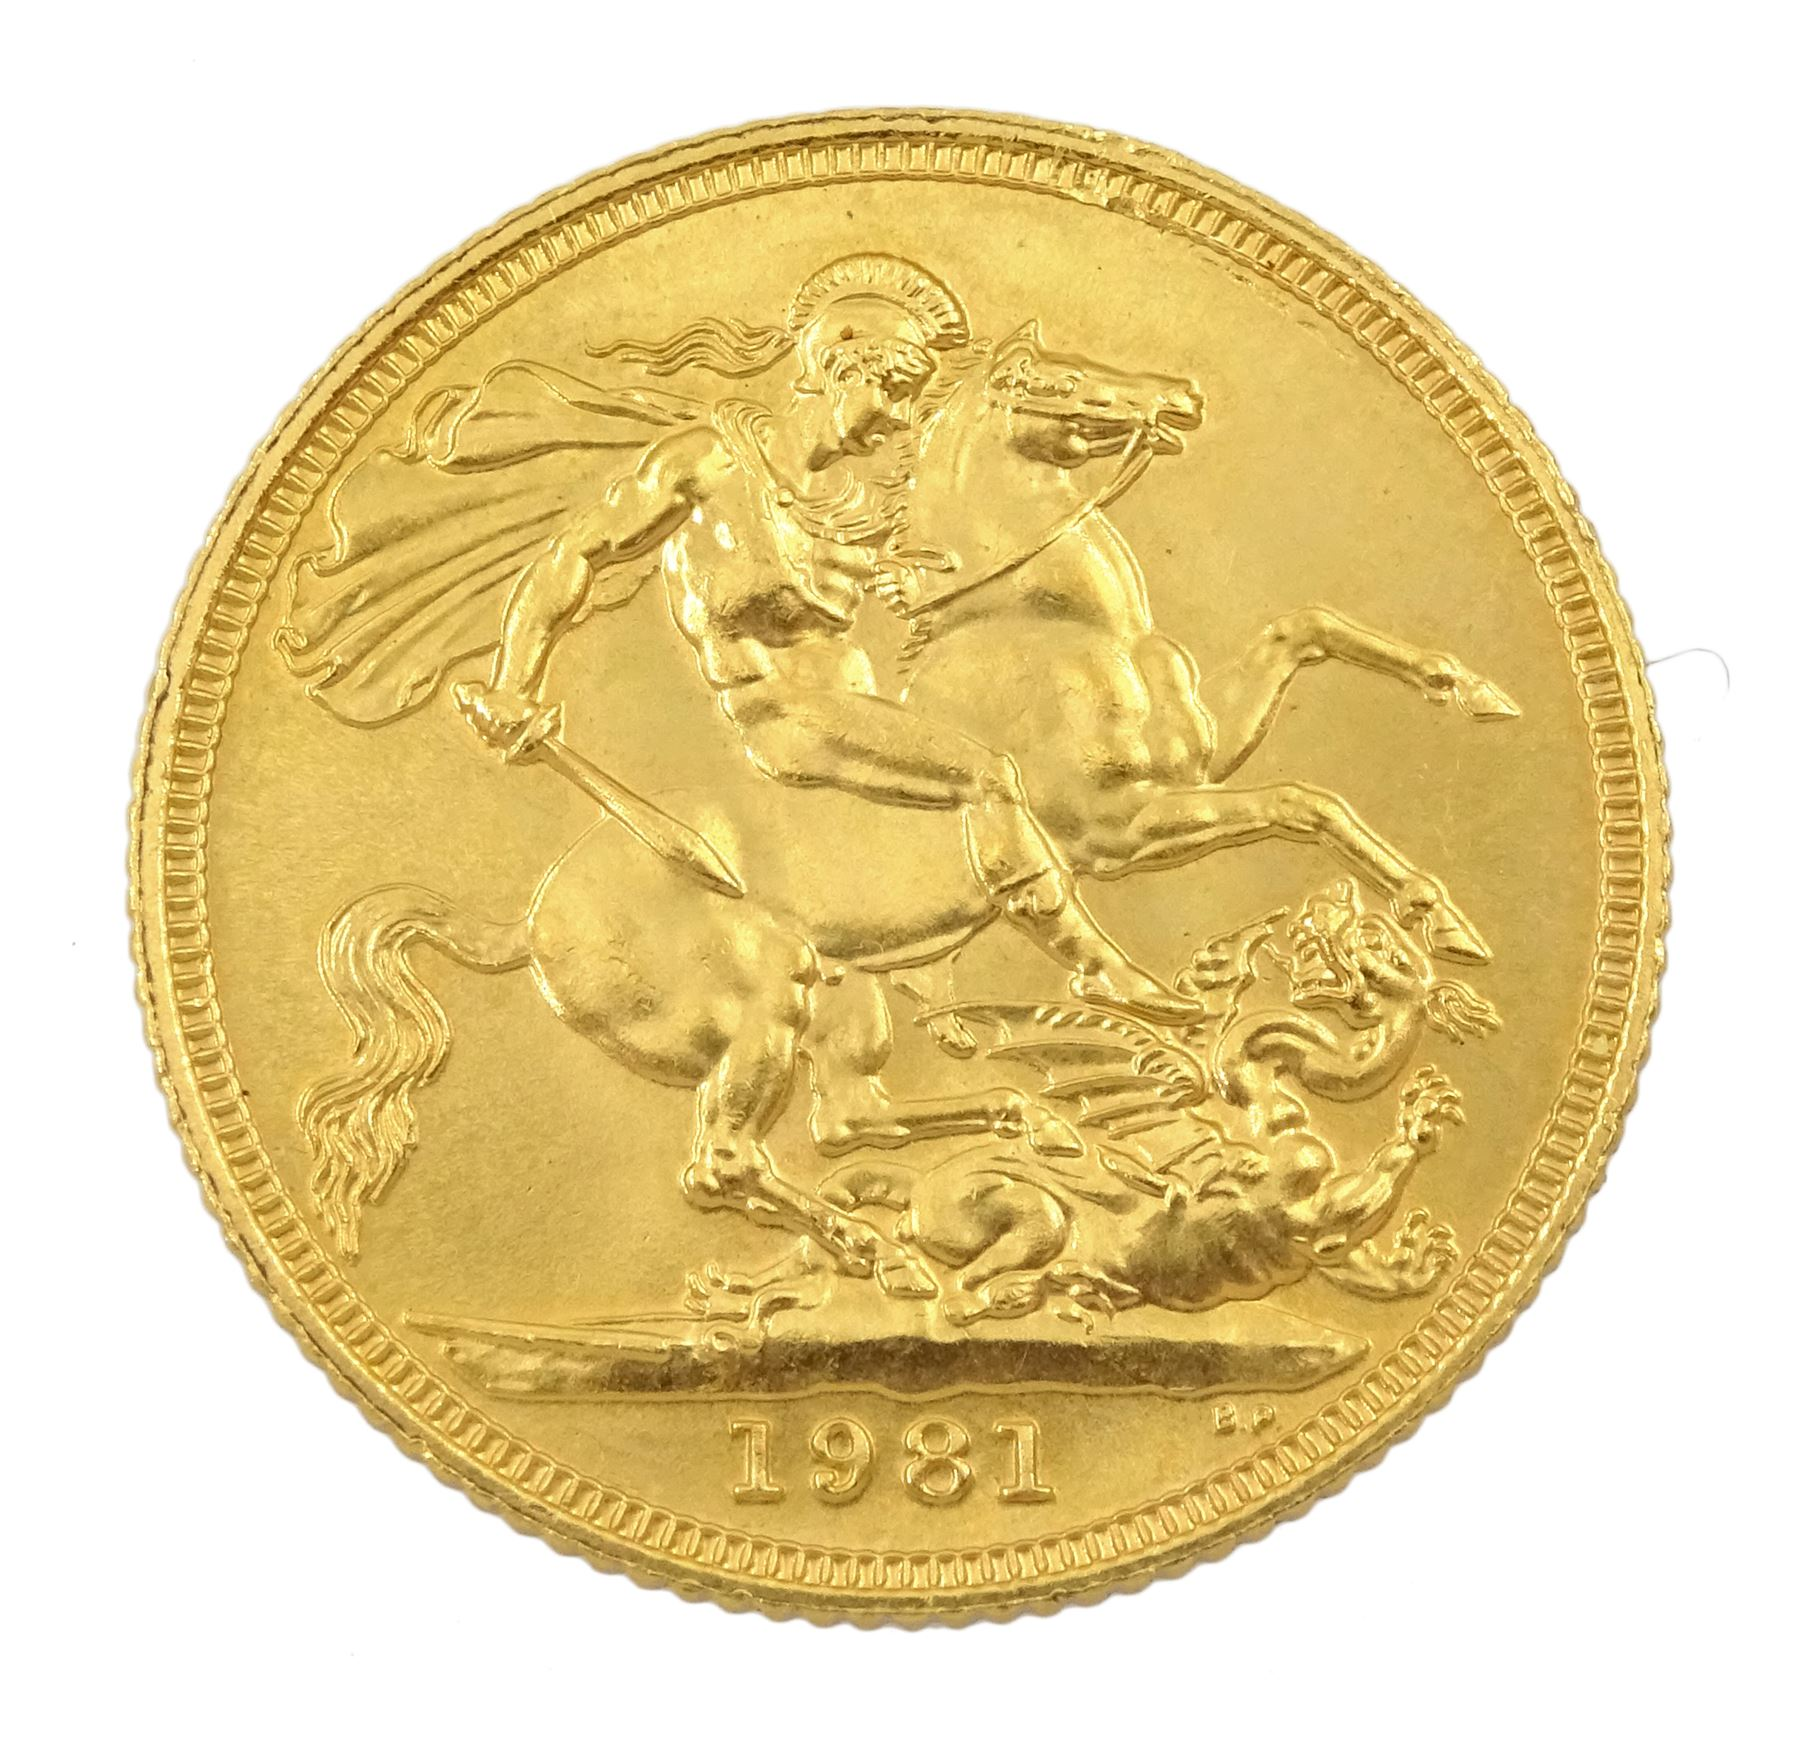 Queen Elizabeth II 1981 gold full sovereign coin - Image 2 of 2